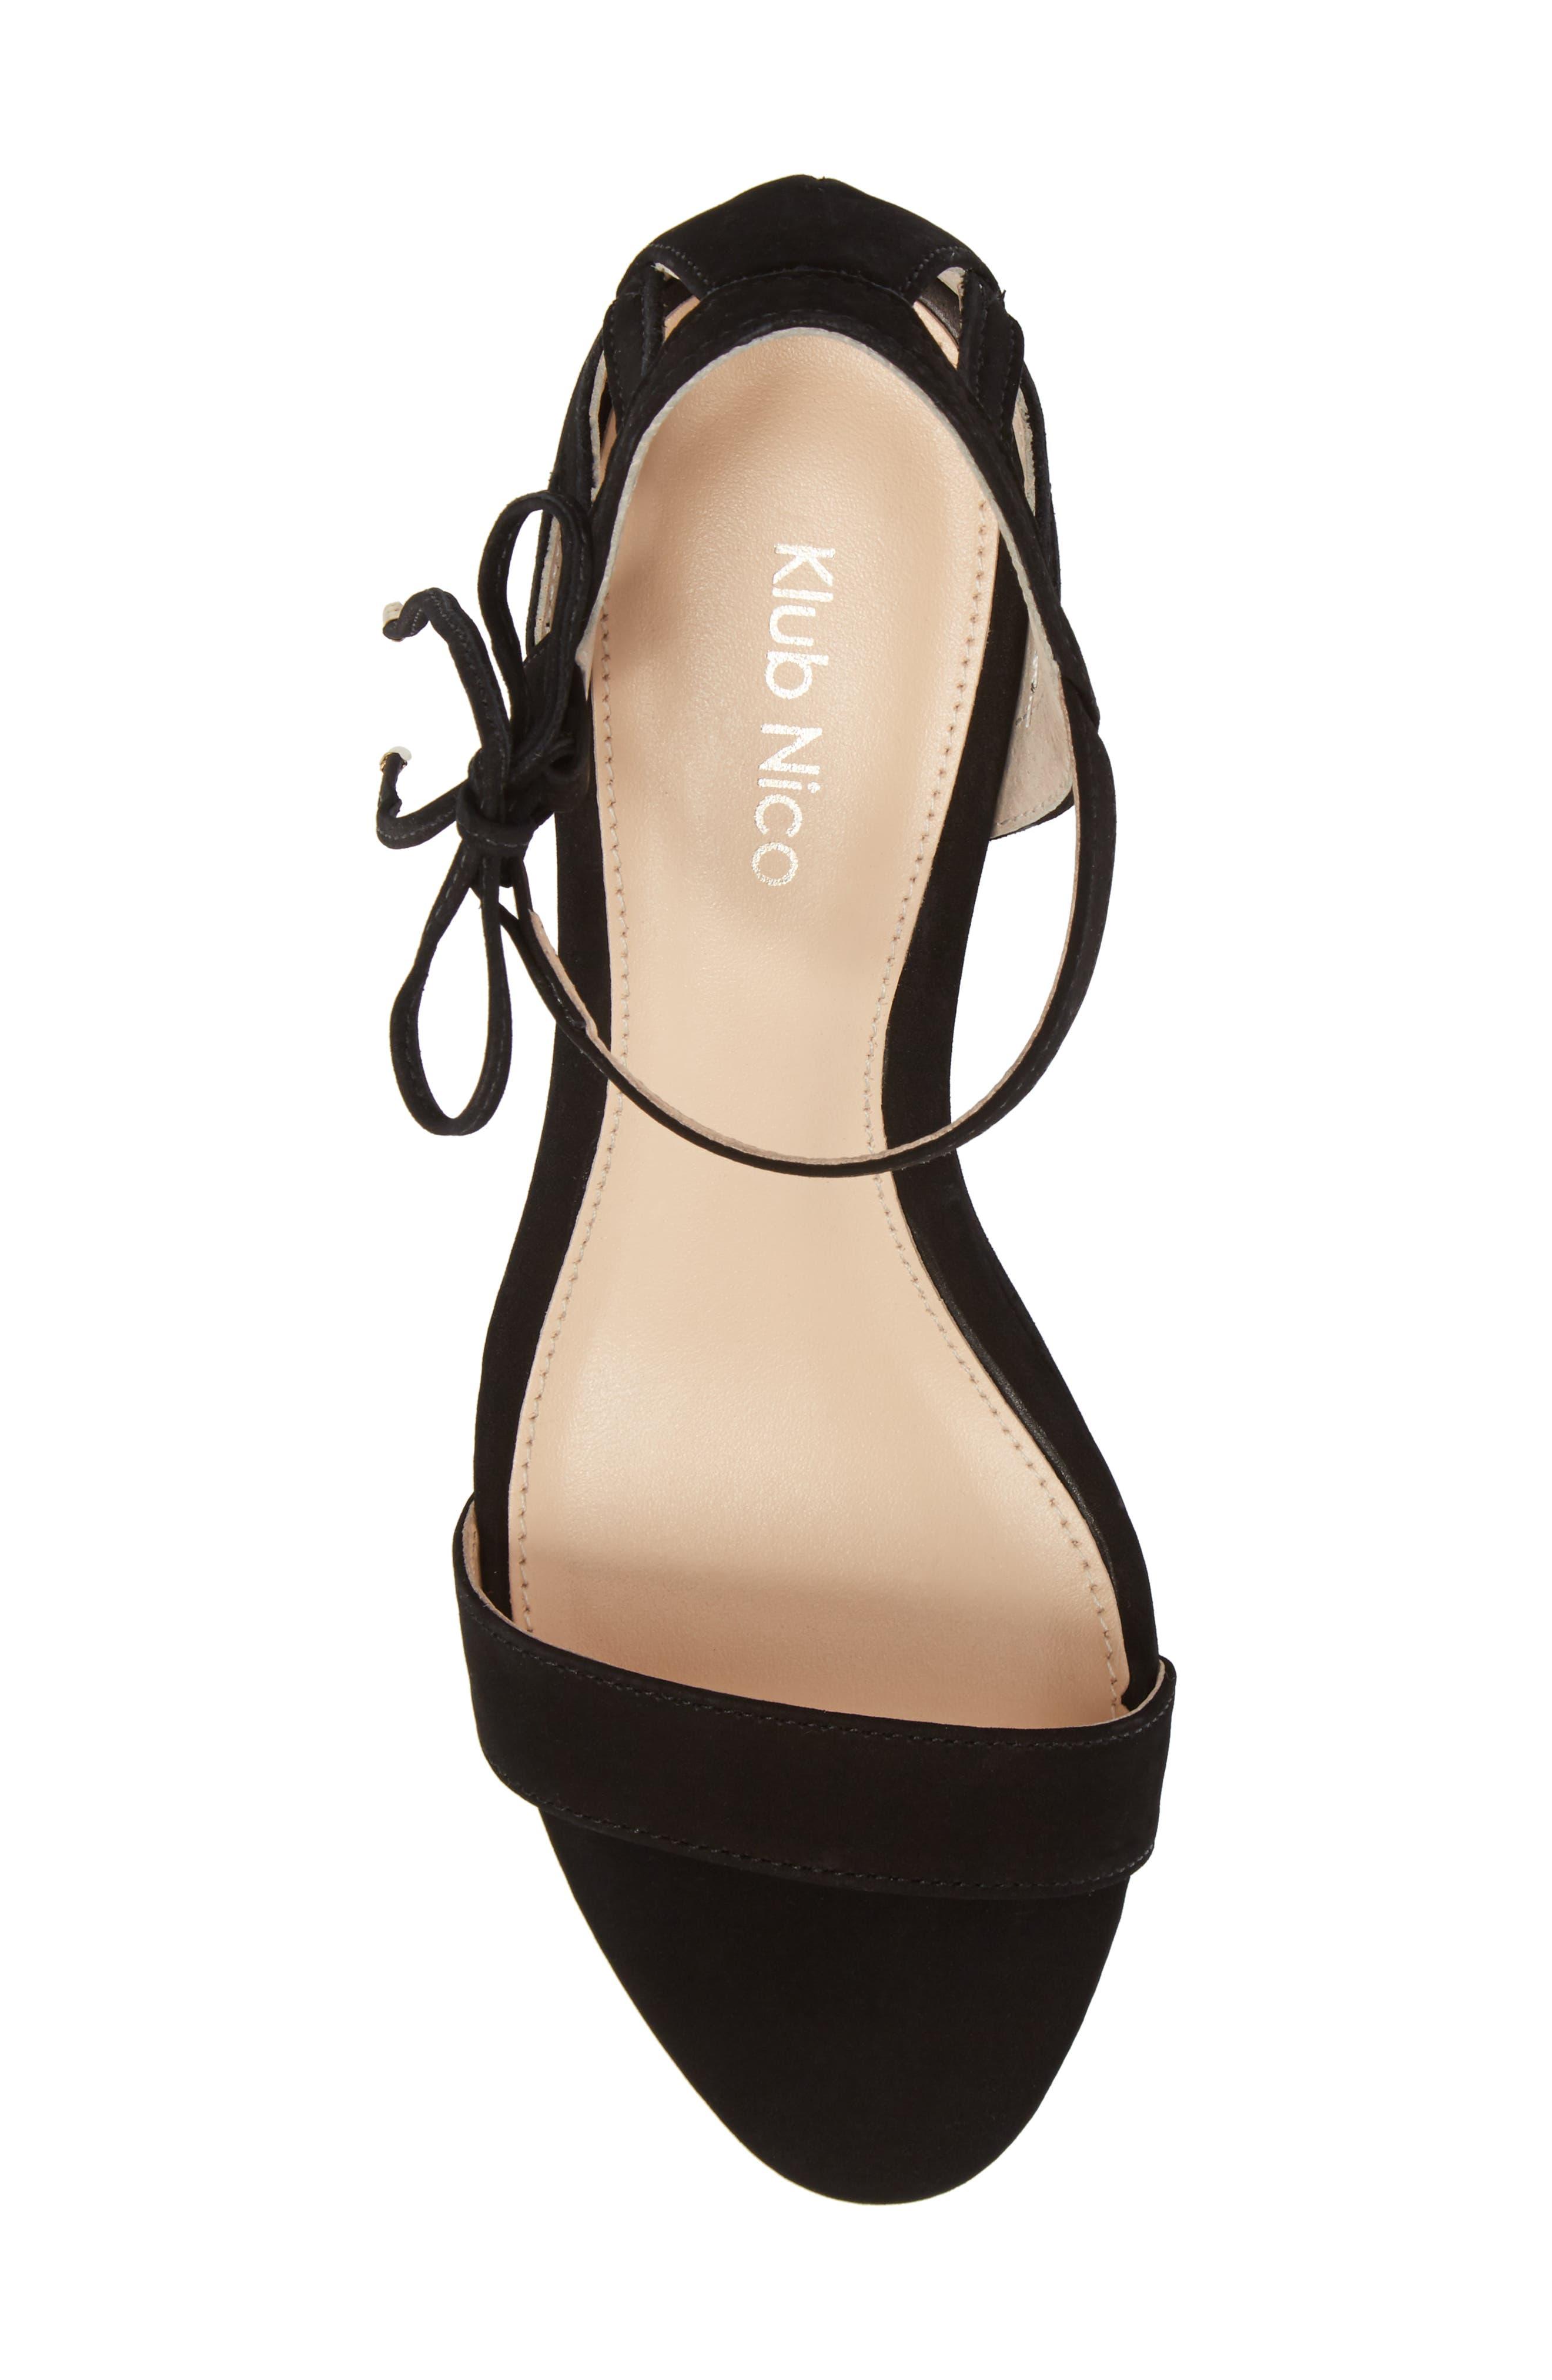 Kaeli Wedge Sandal,                             Alternate thumbnail 5, color,                             BLACK LEATHER